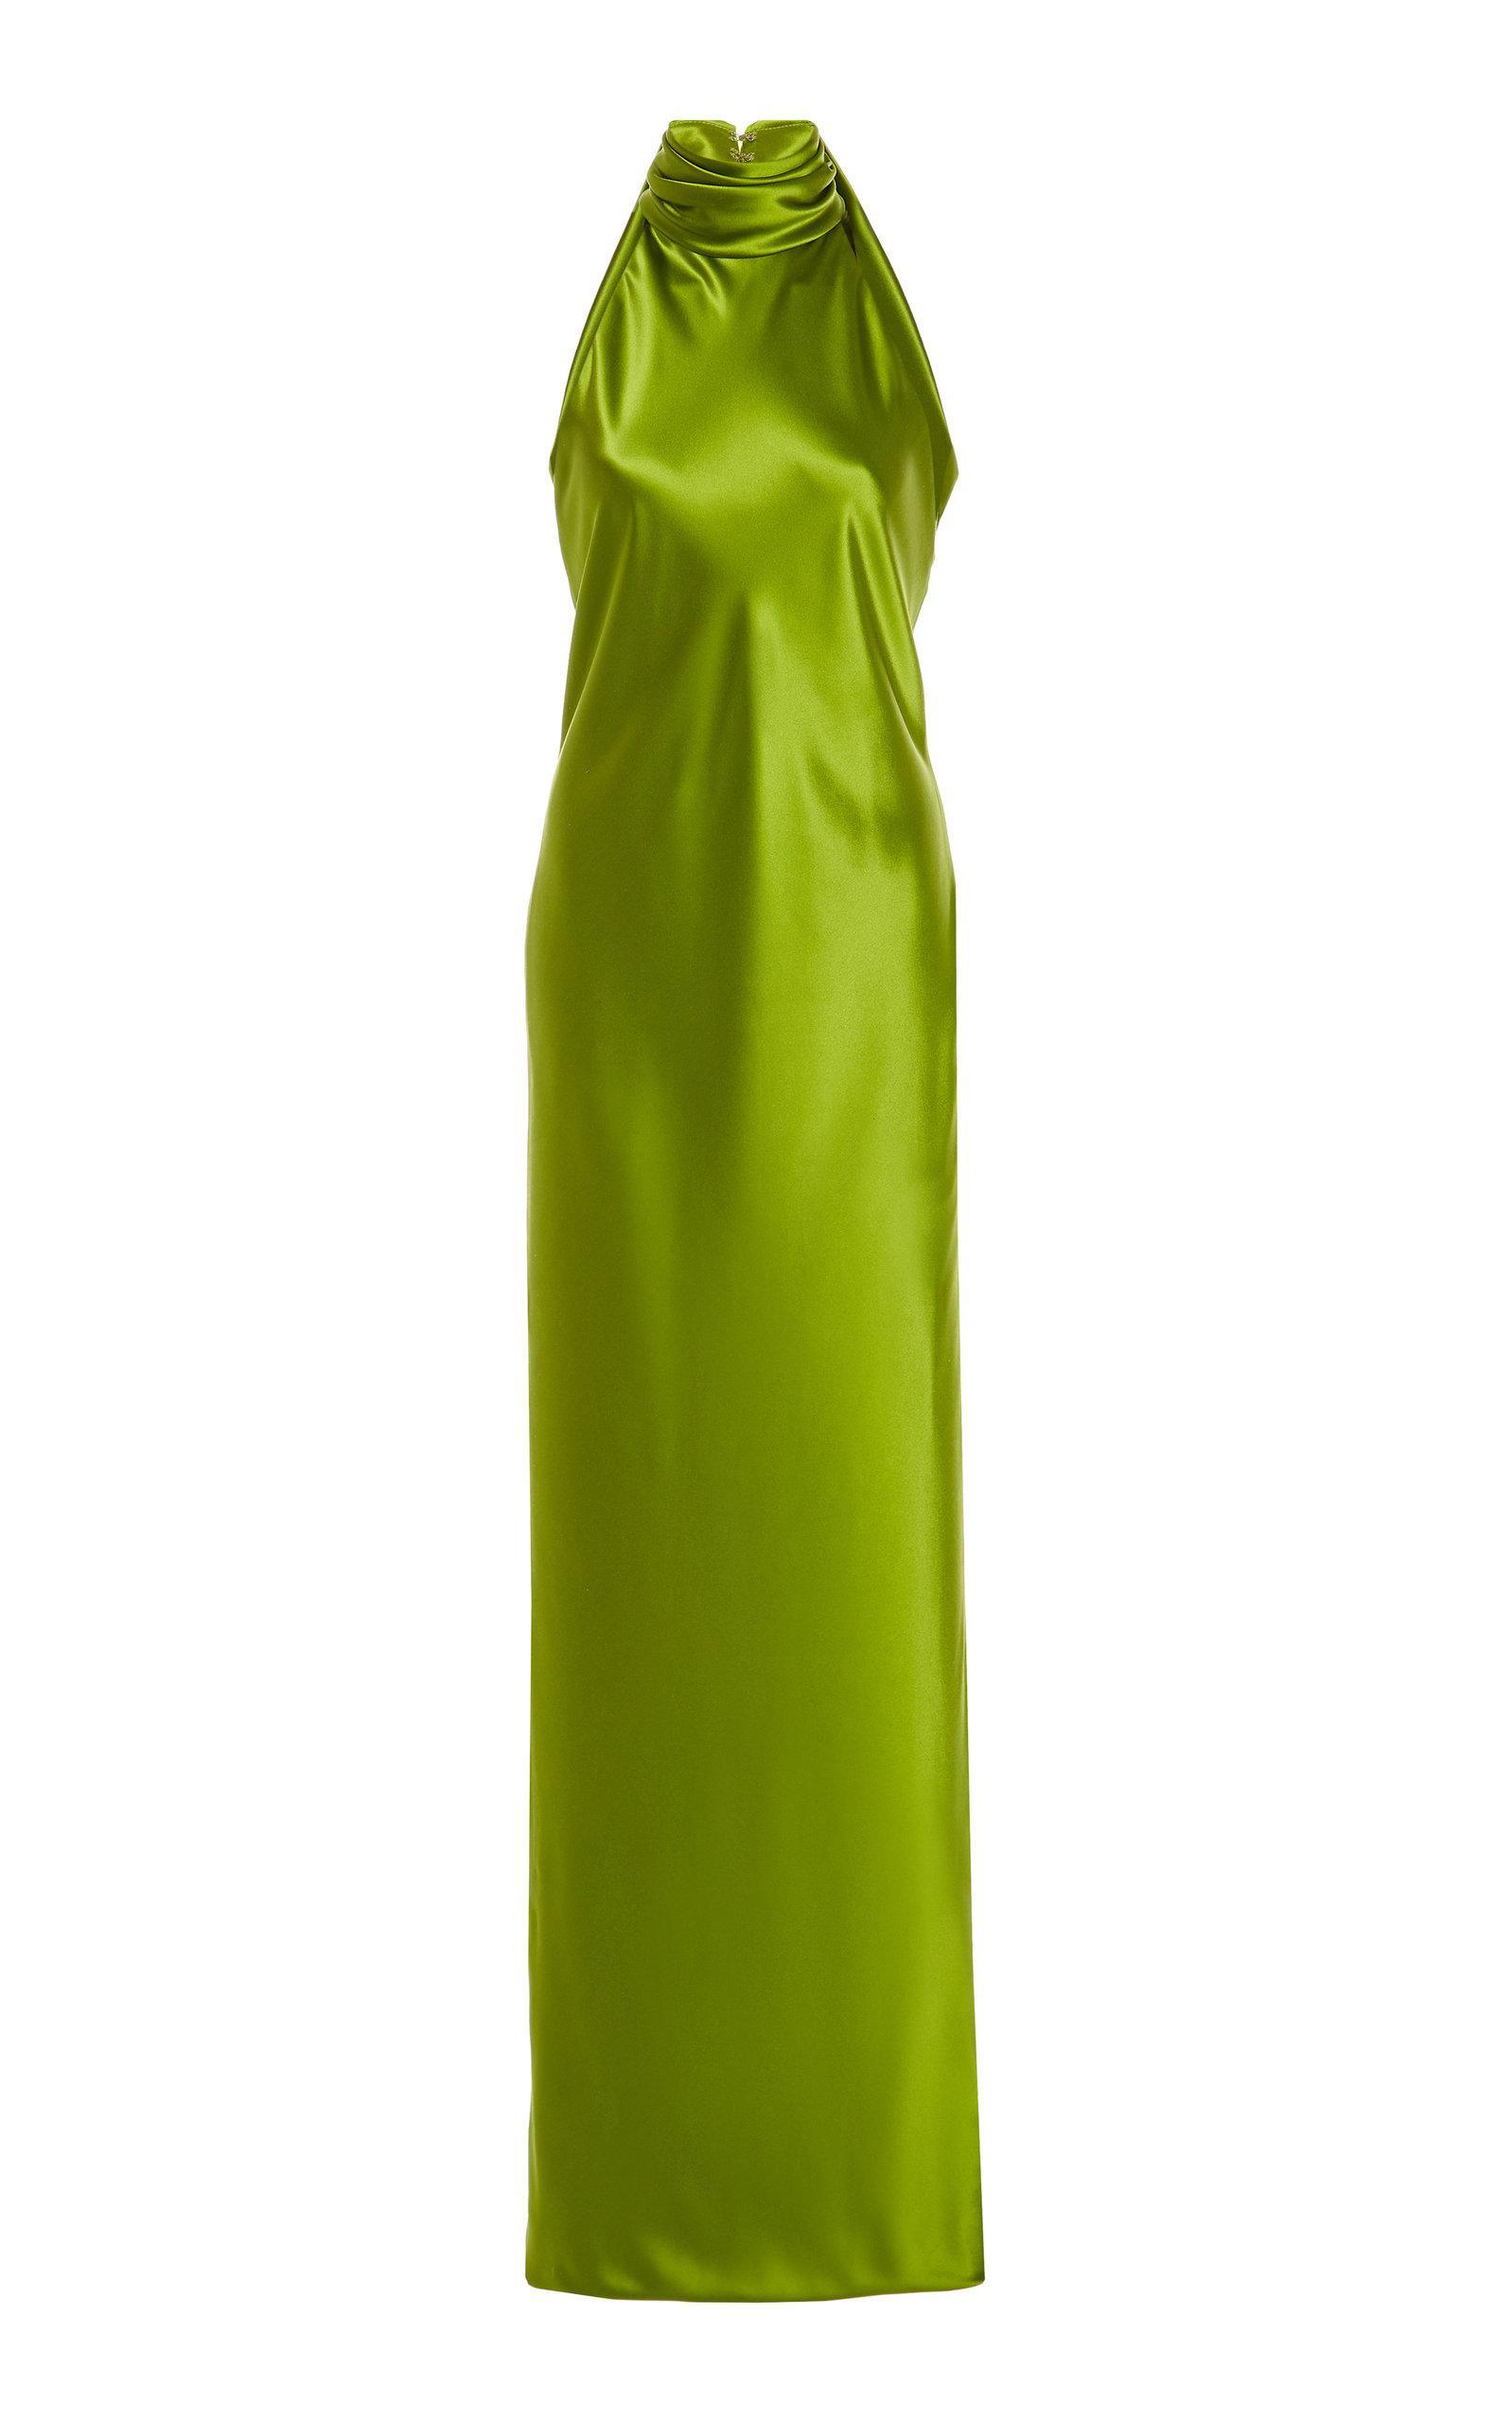 fb435493148 Brandon Maxwell. Women s Green Satin Halterneck Gown.  3